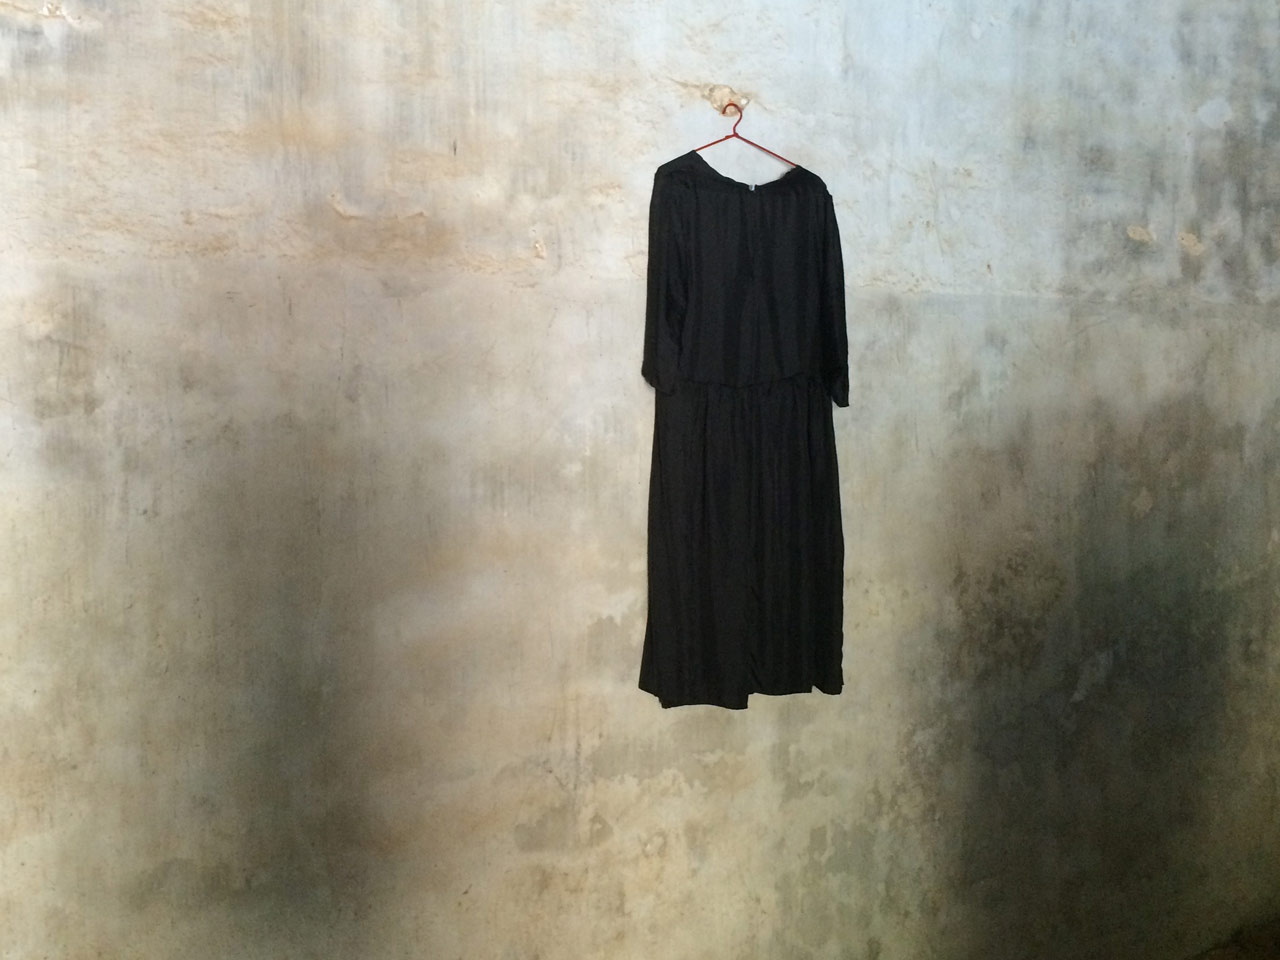 Dress-on-wall